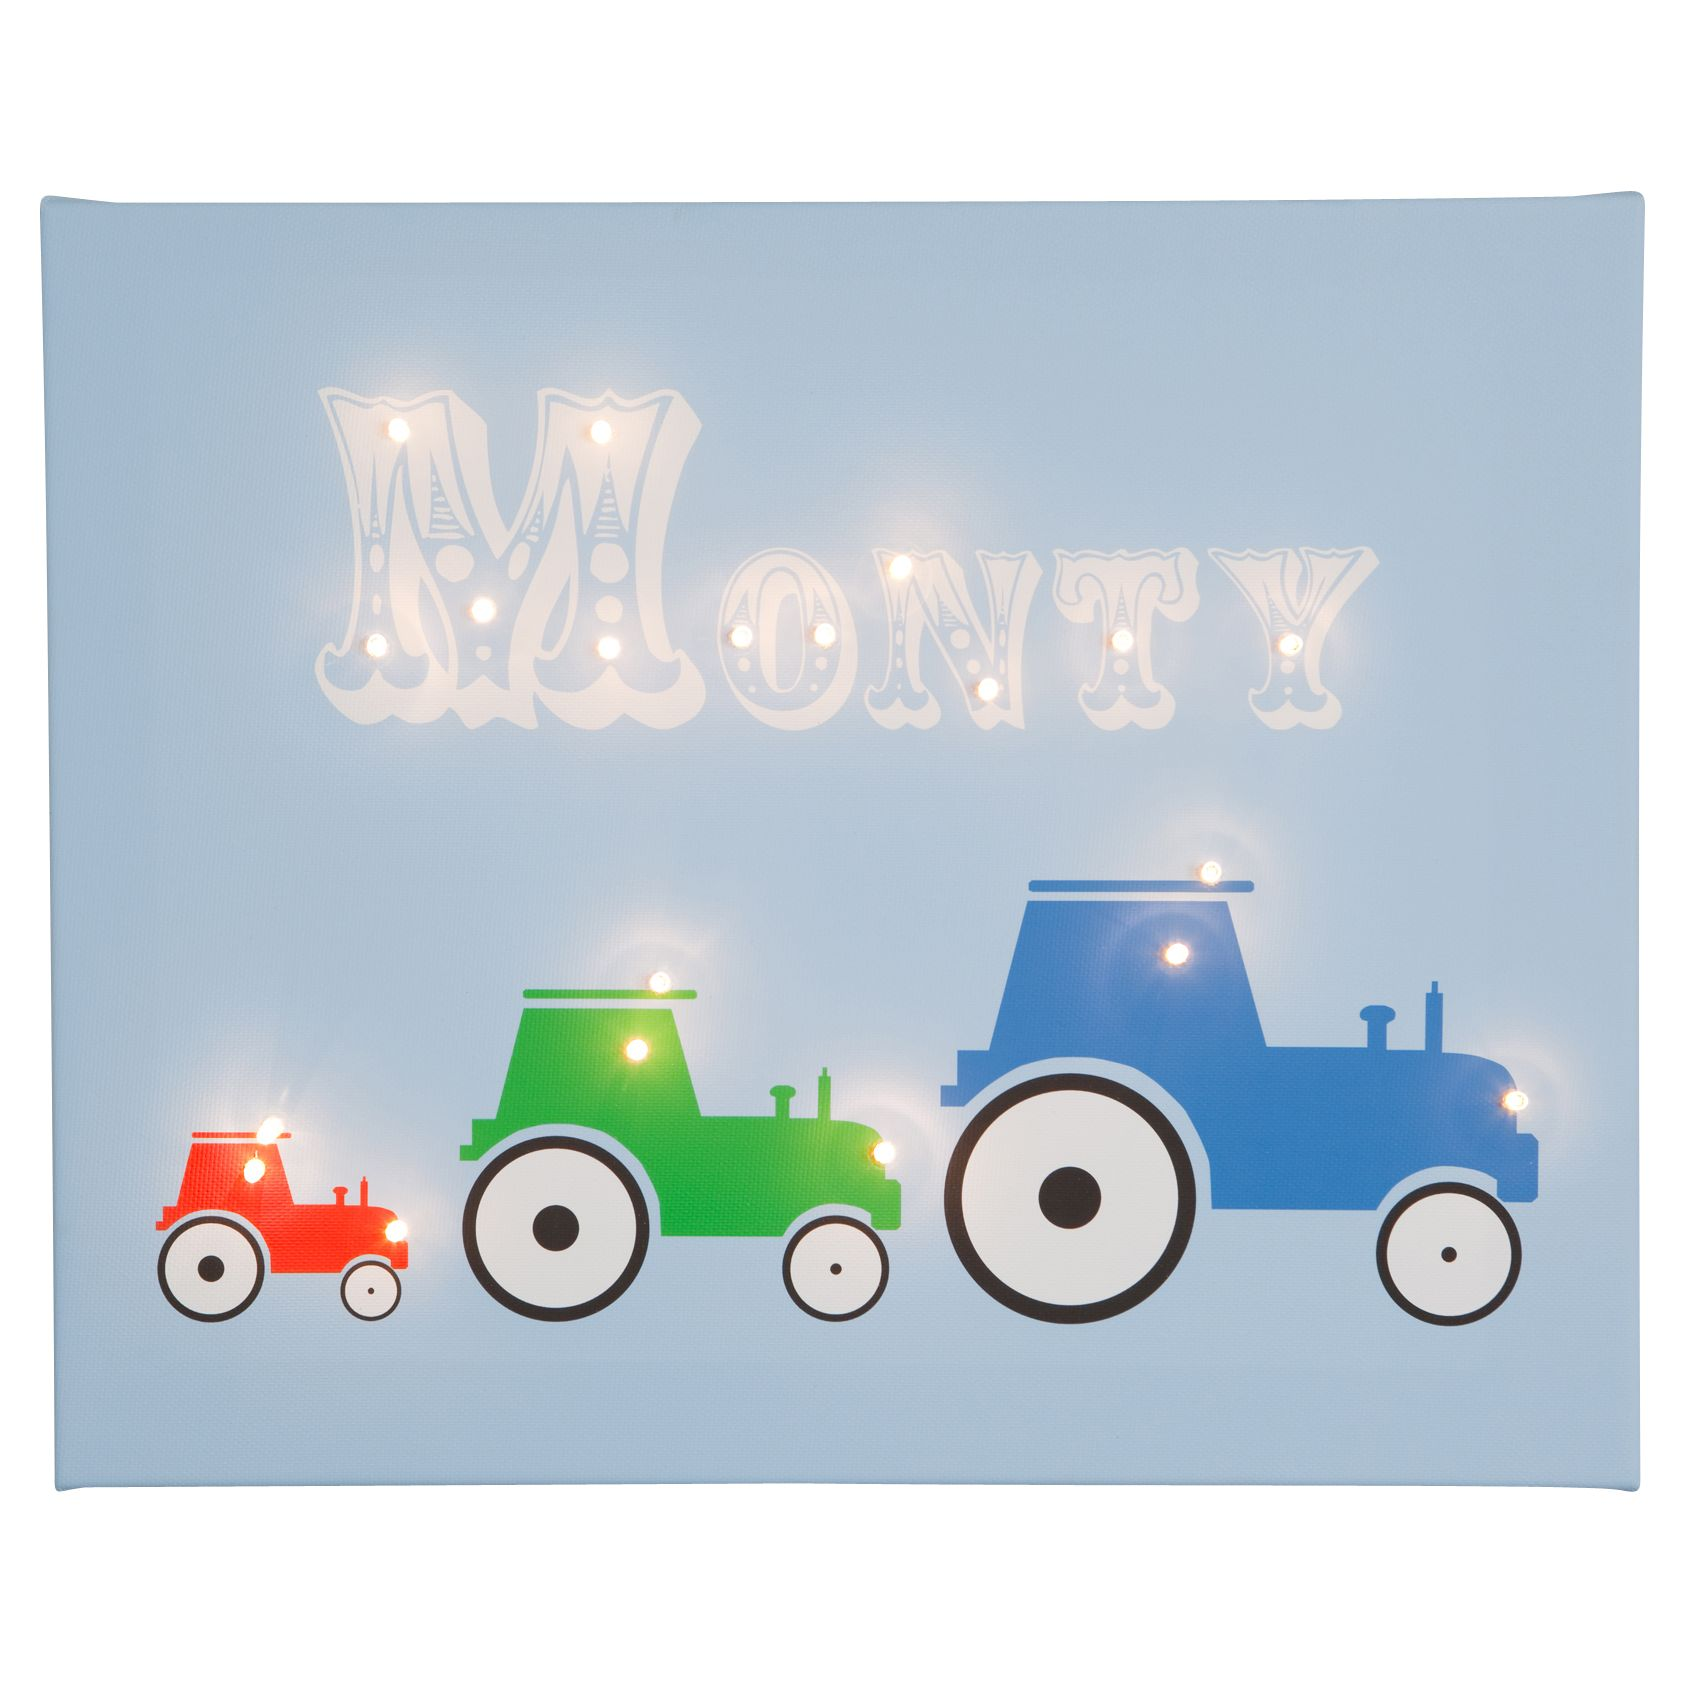 Illuminated Canvas Illuminated Canvas Personalised 3 Tractors LED Canvas, 40 x 60cm, Blue